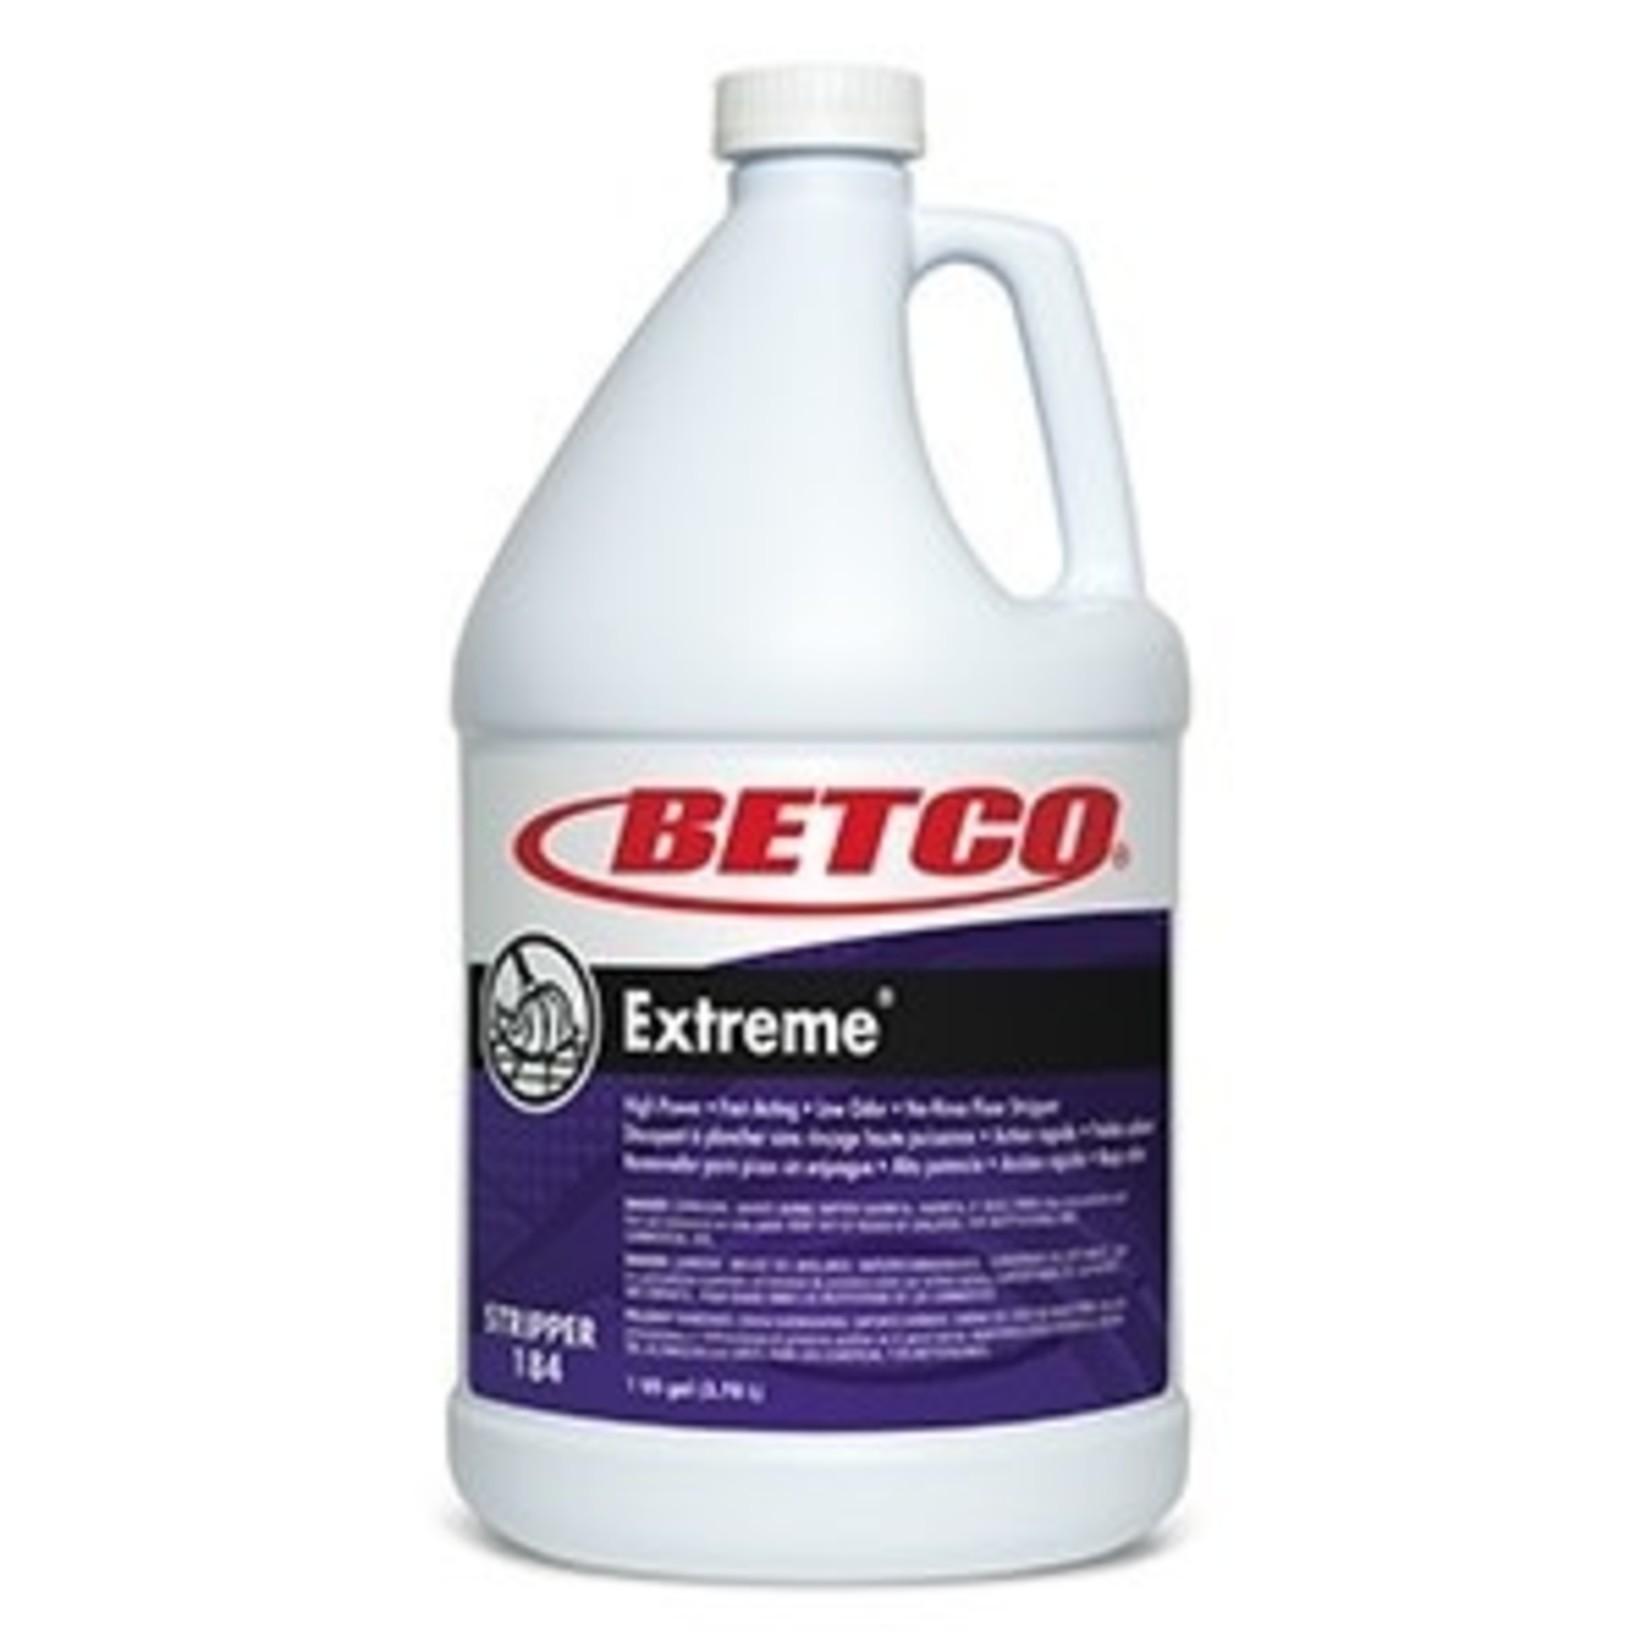 Betco Extreme® Floor Stripper  - GALLON